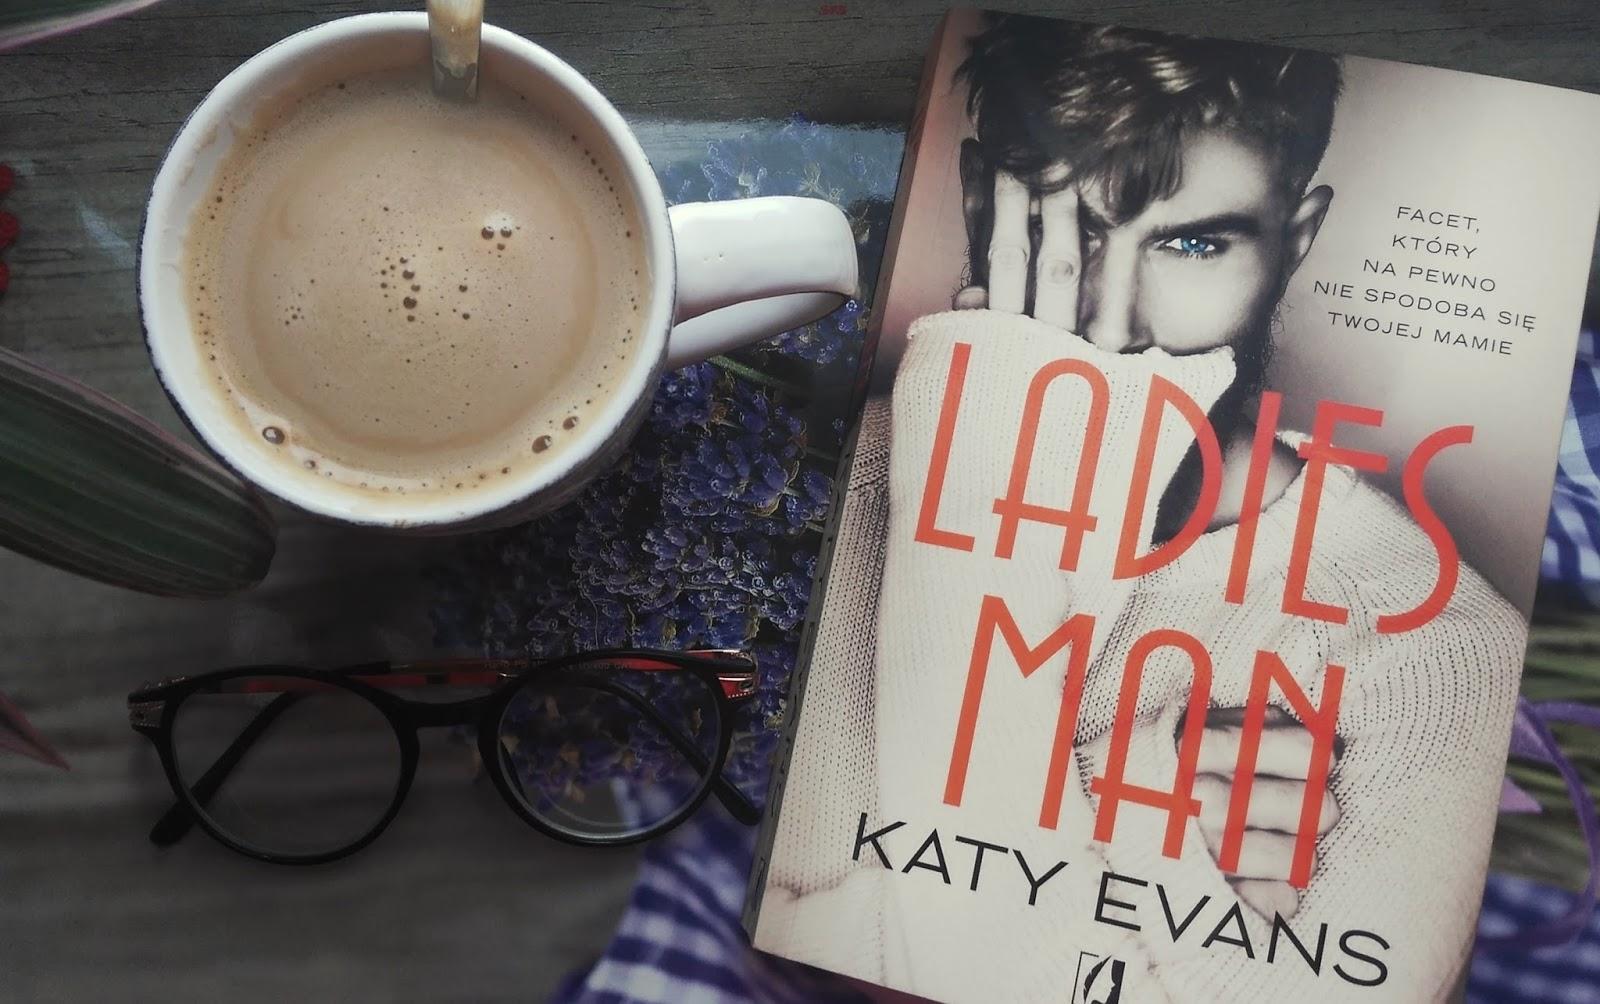 Ladies Man Katy Evans - recenzja